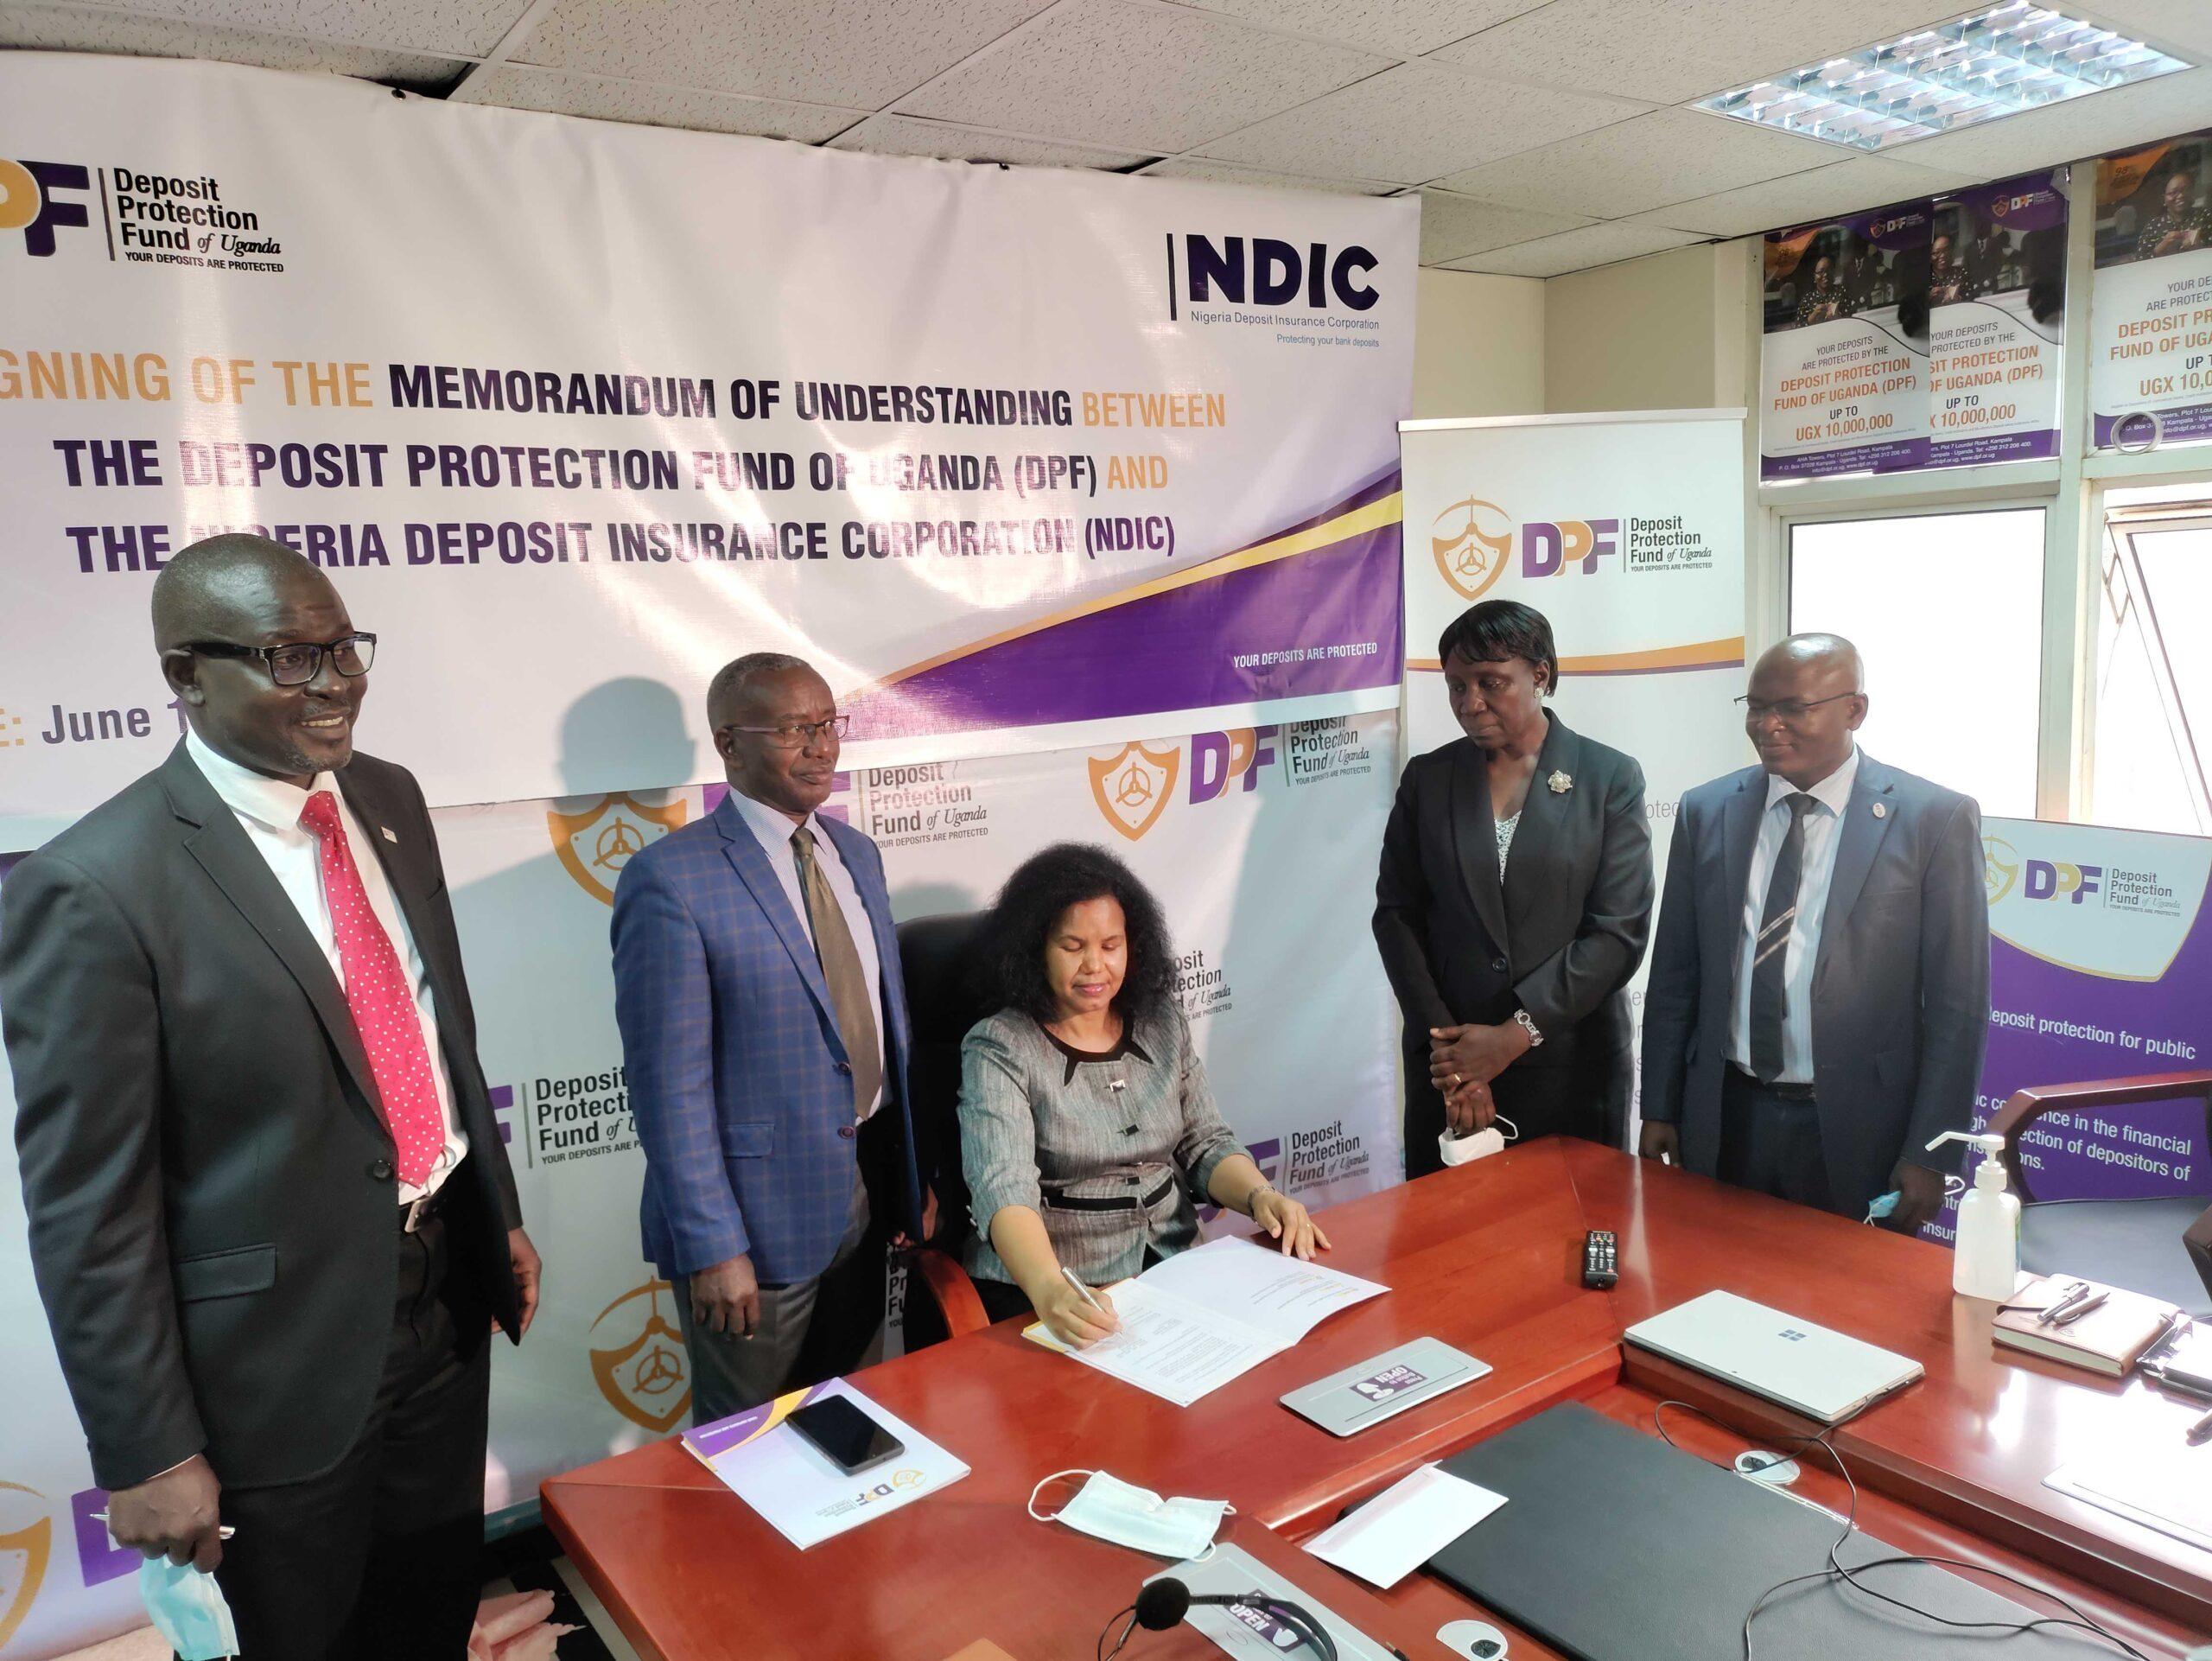 MoU Signed Between Deposit Protection Fund Of Uganda (DPF) And Nigeria Deposit Insurance Corporation (NDIC)